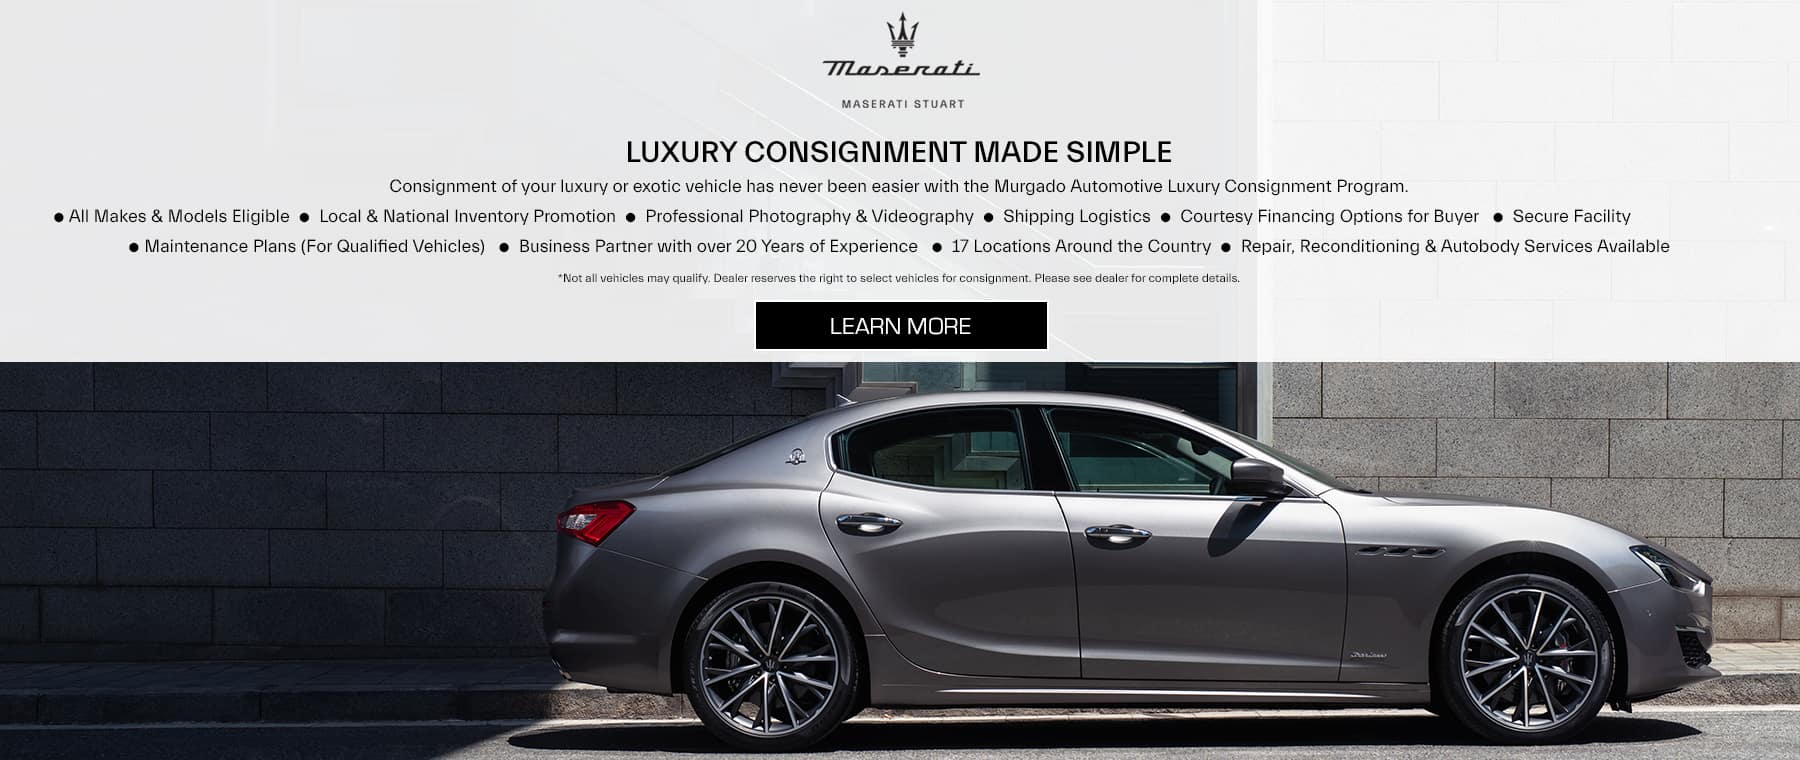 Maserati Stuart luxury consignment